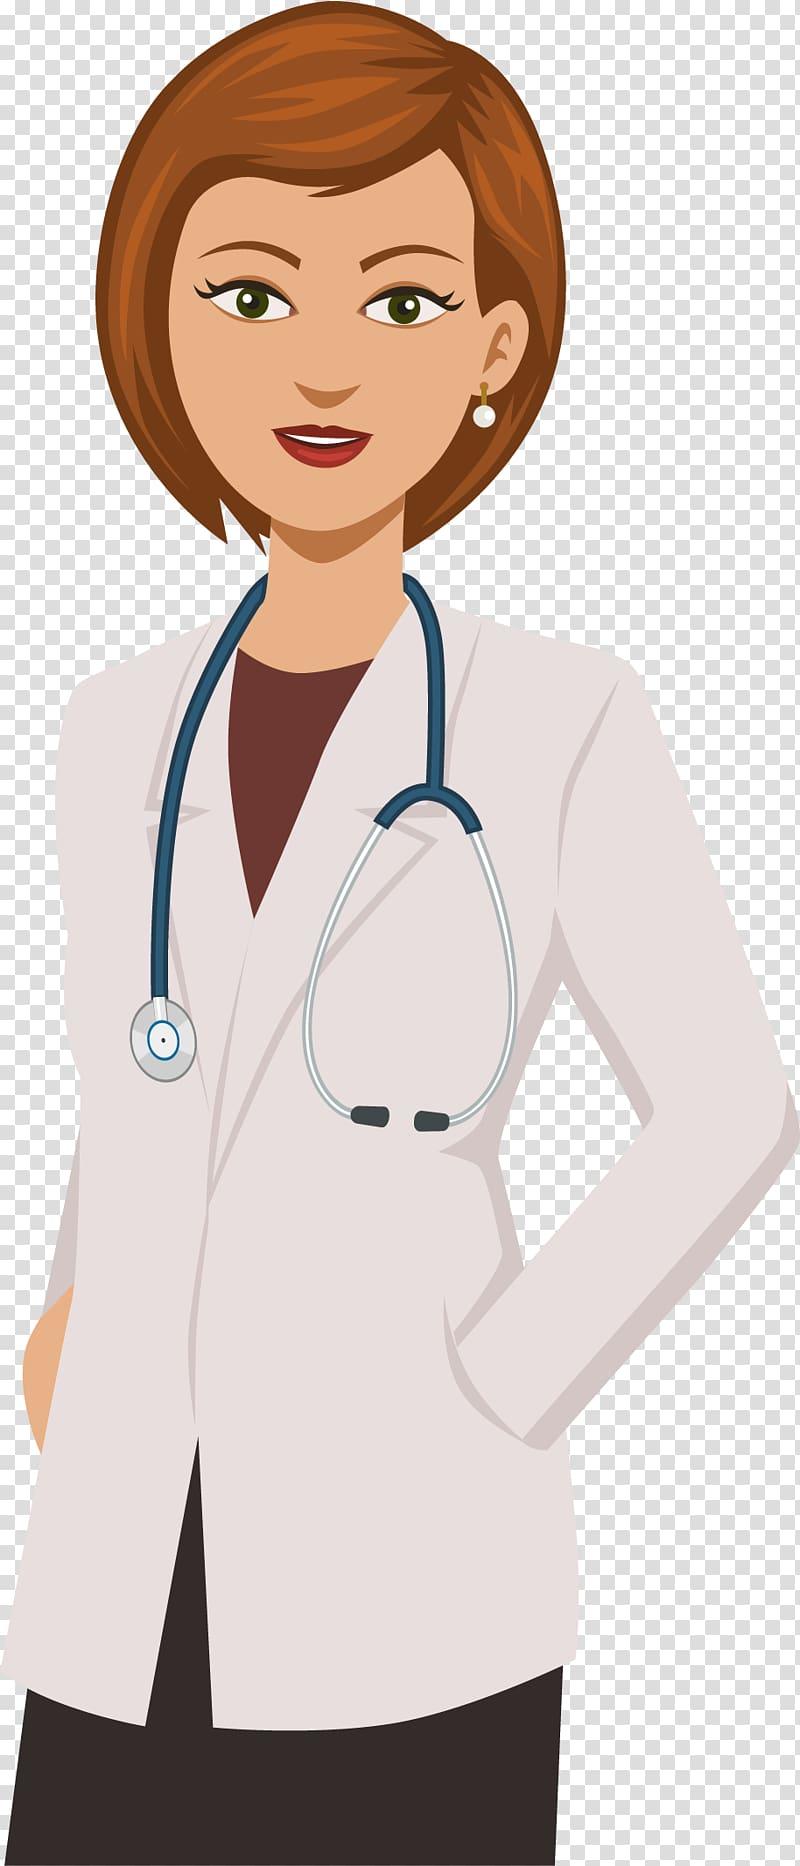 Female doctor illustration, Cartoon Network Physician.